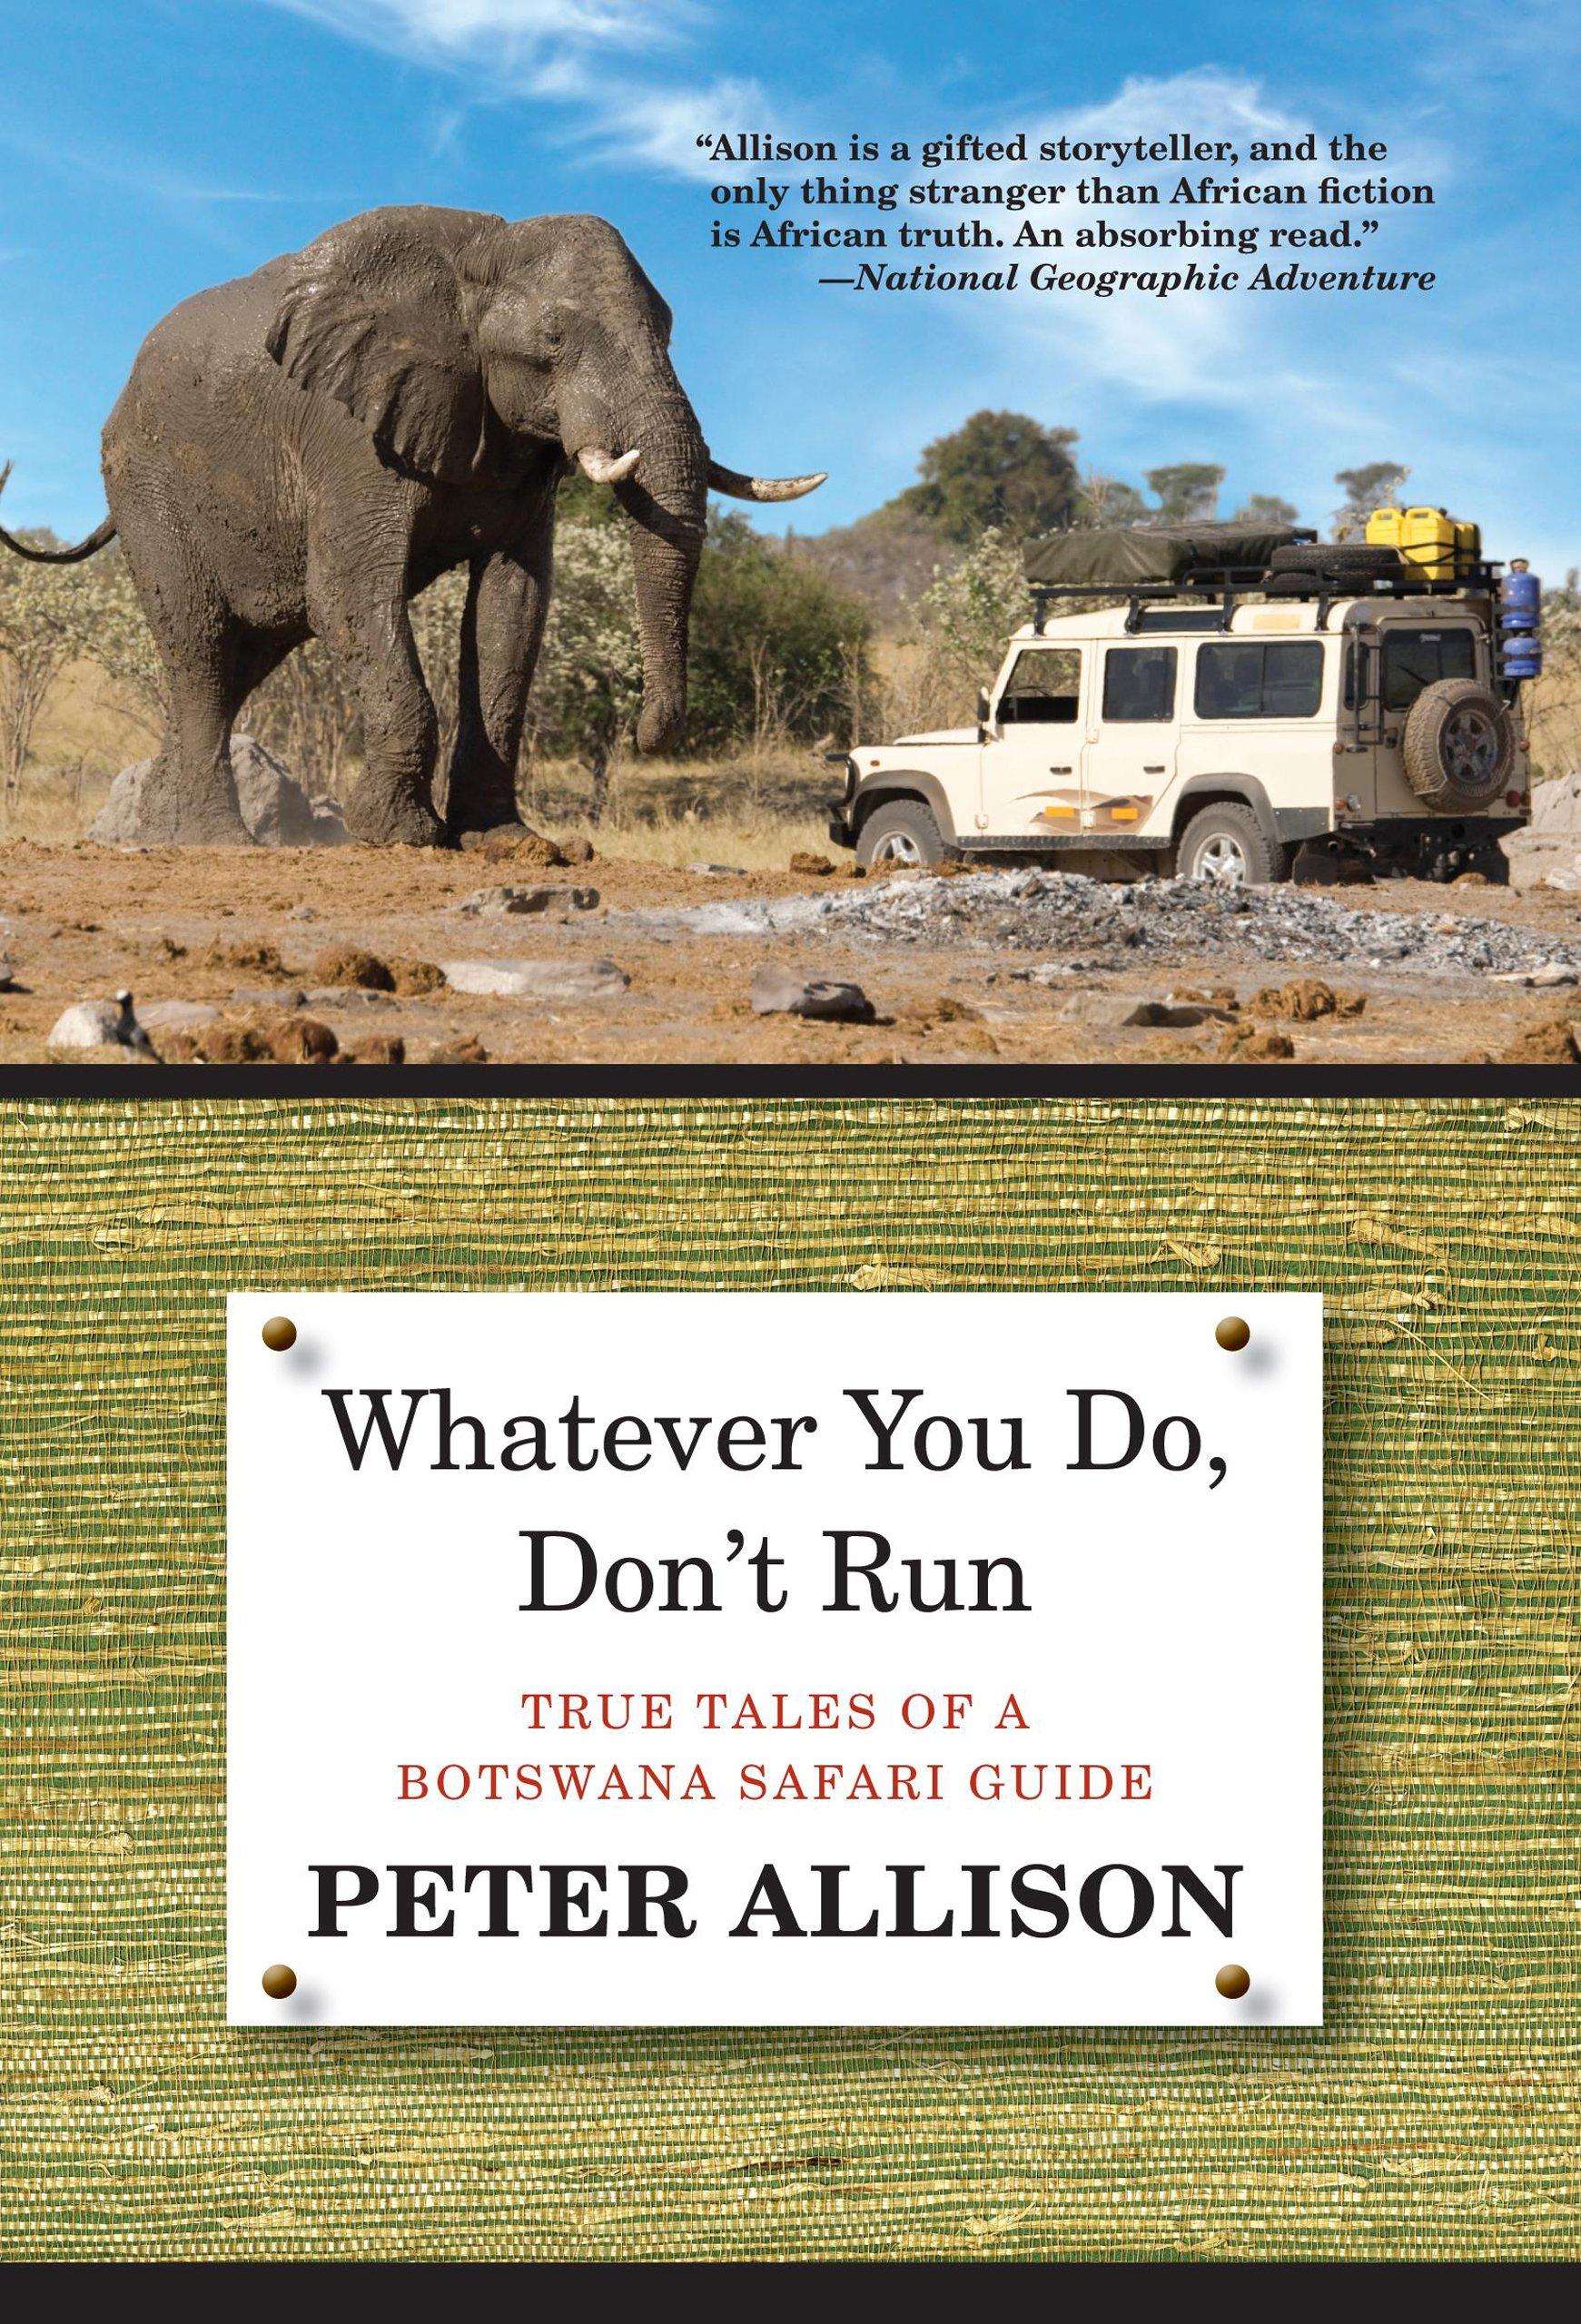 Nuevo Animal Planet Mini Mojo Elefante Africano Juguete Safari-entrega UK LIBRE!